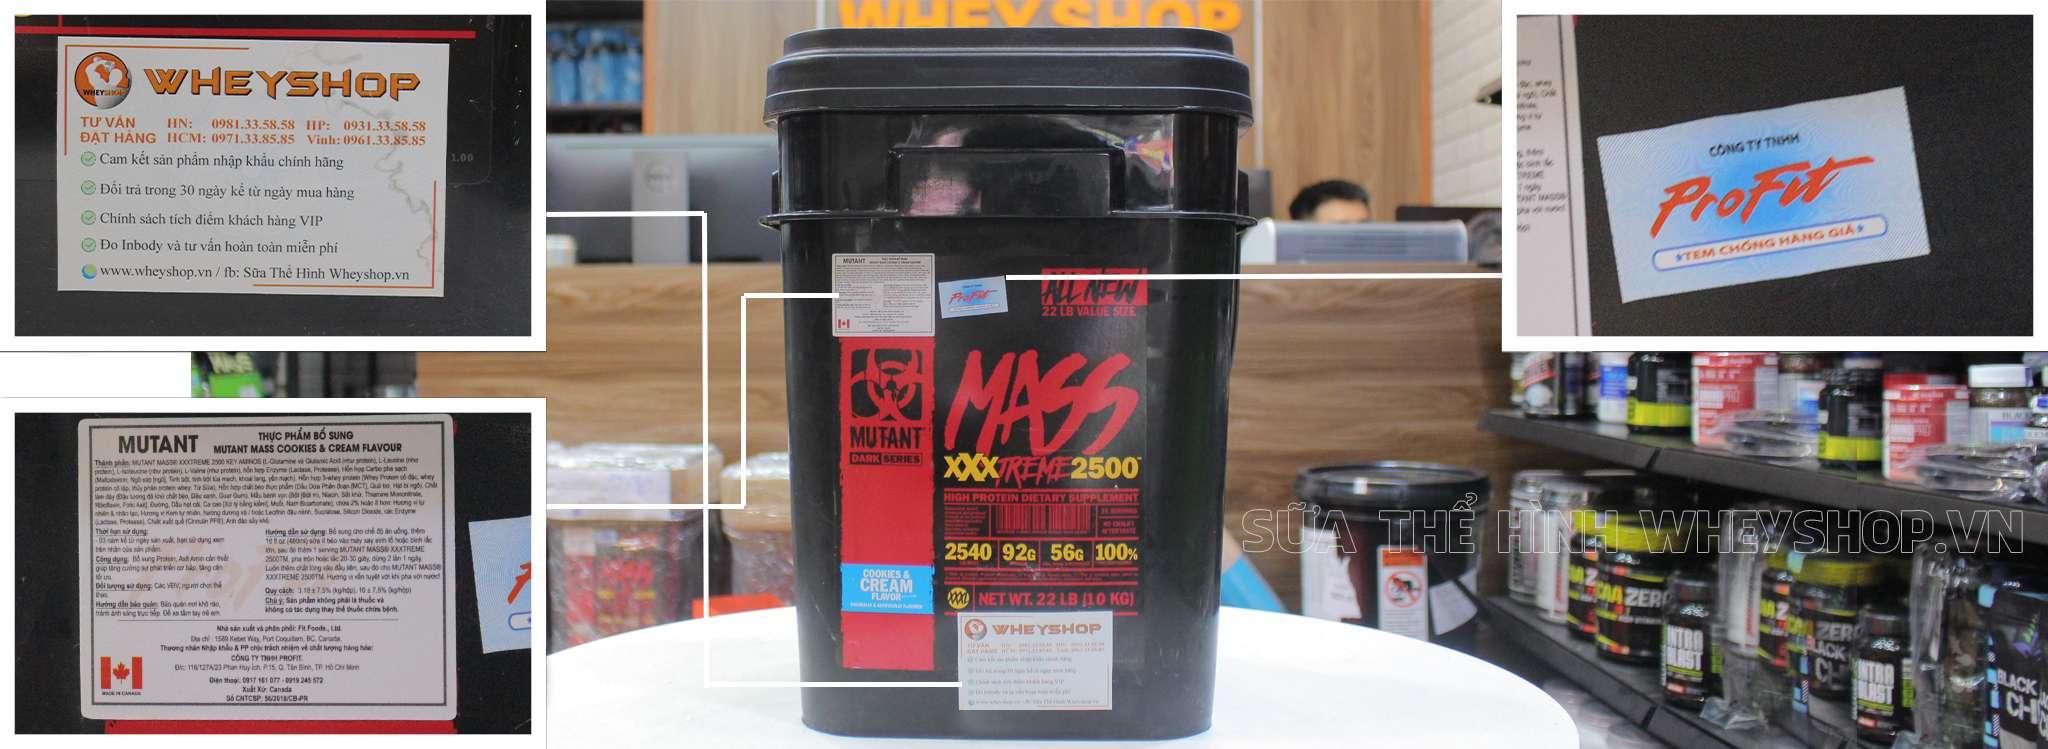 Mutant Mass XXXtreme 2500 tem nhan hieu chinh hang tai wheyshop